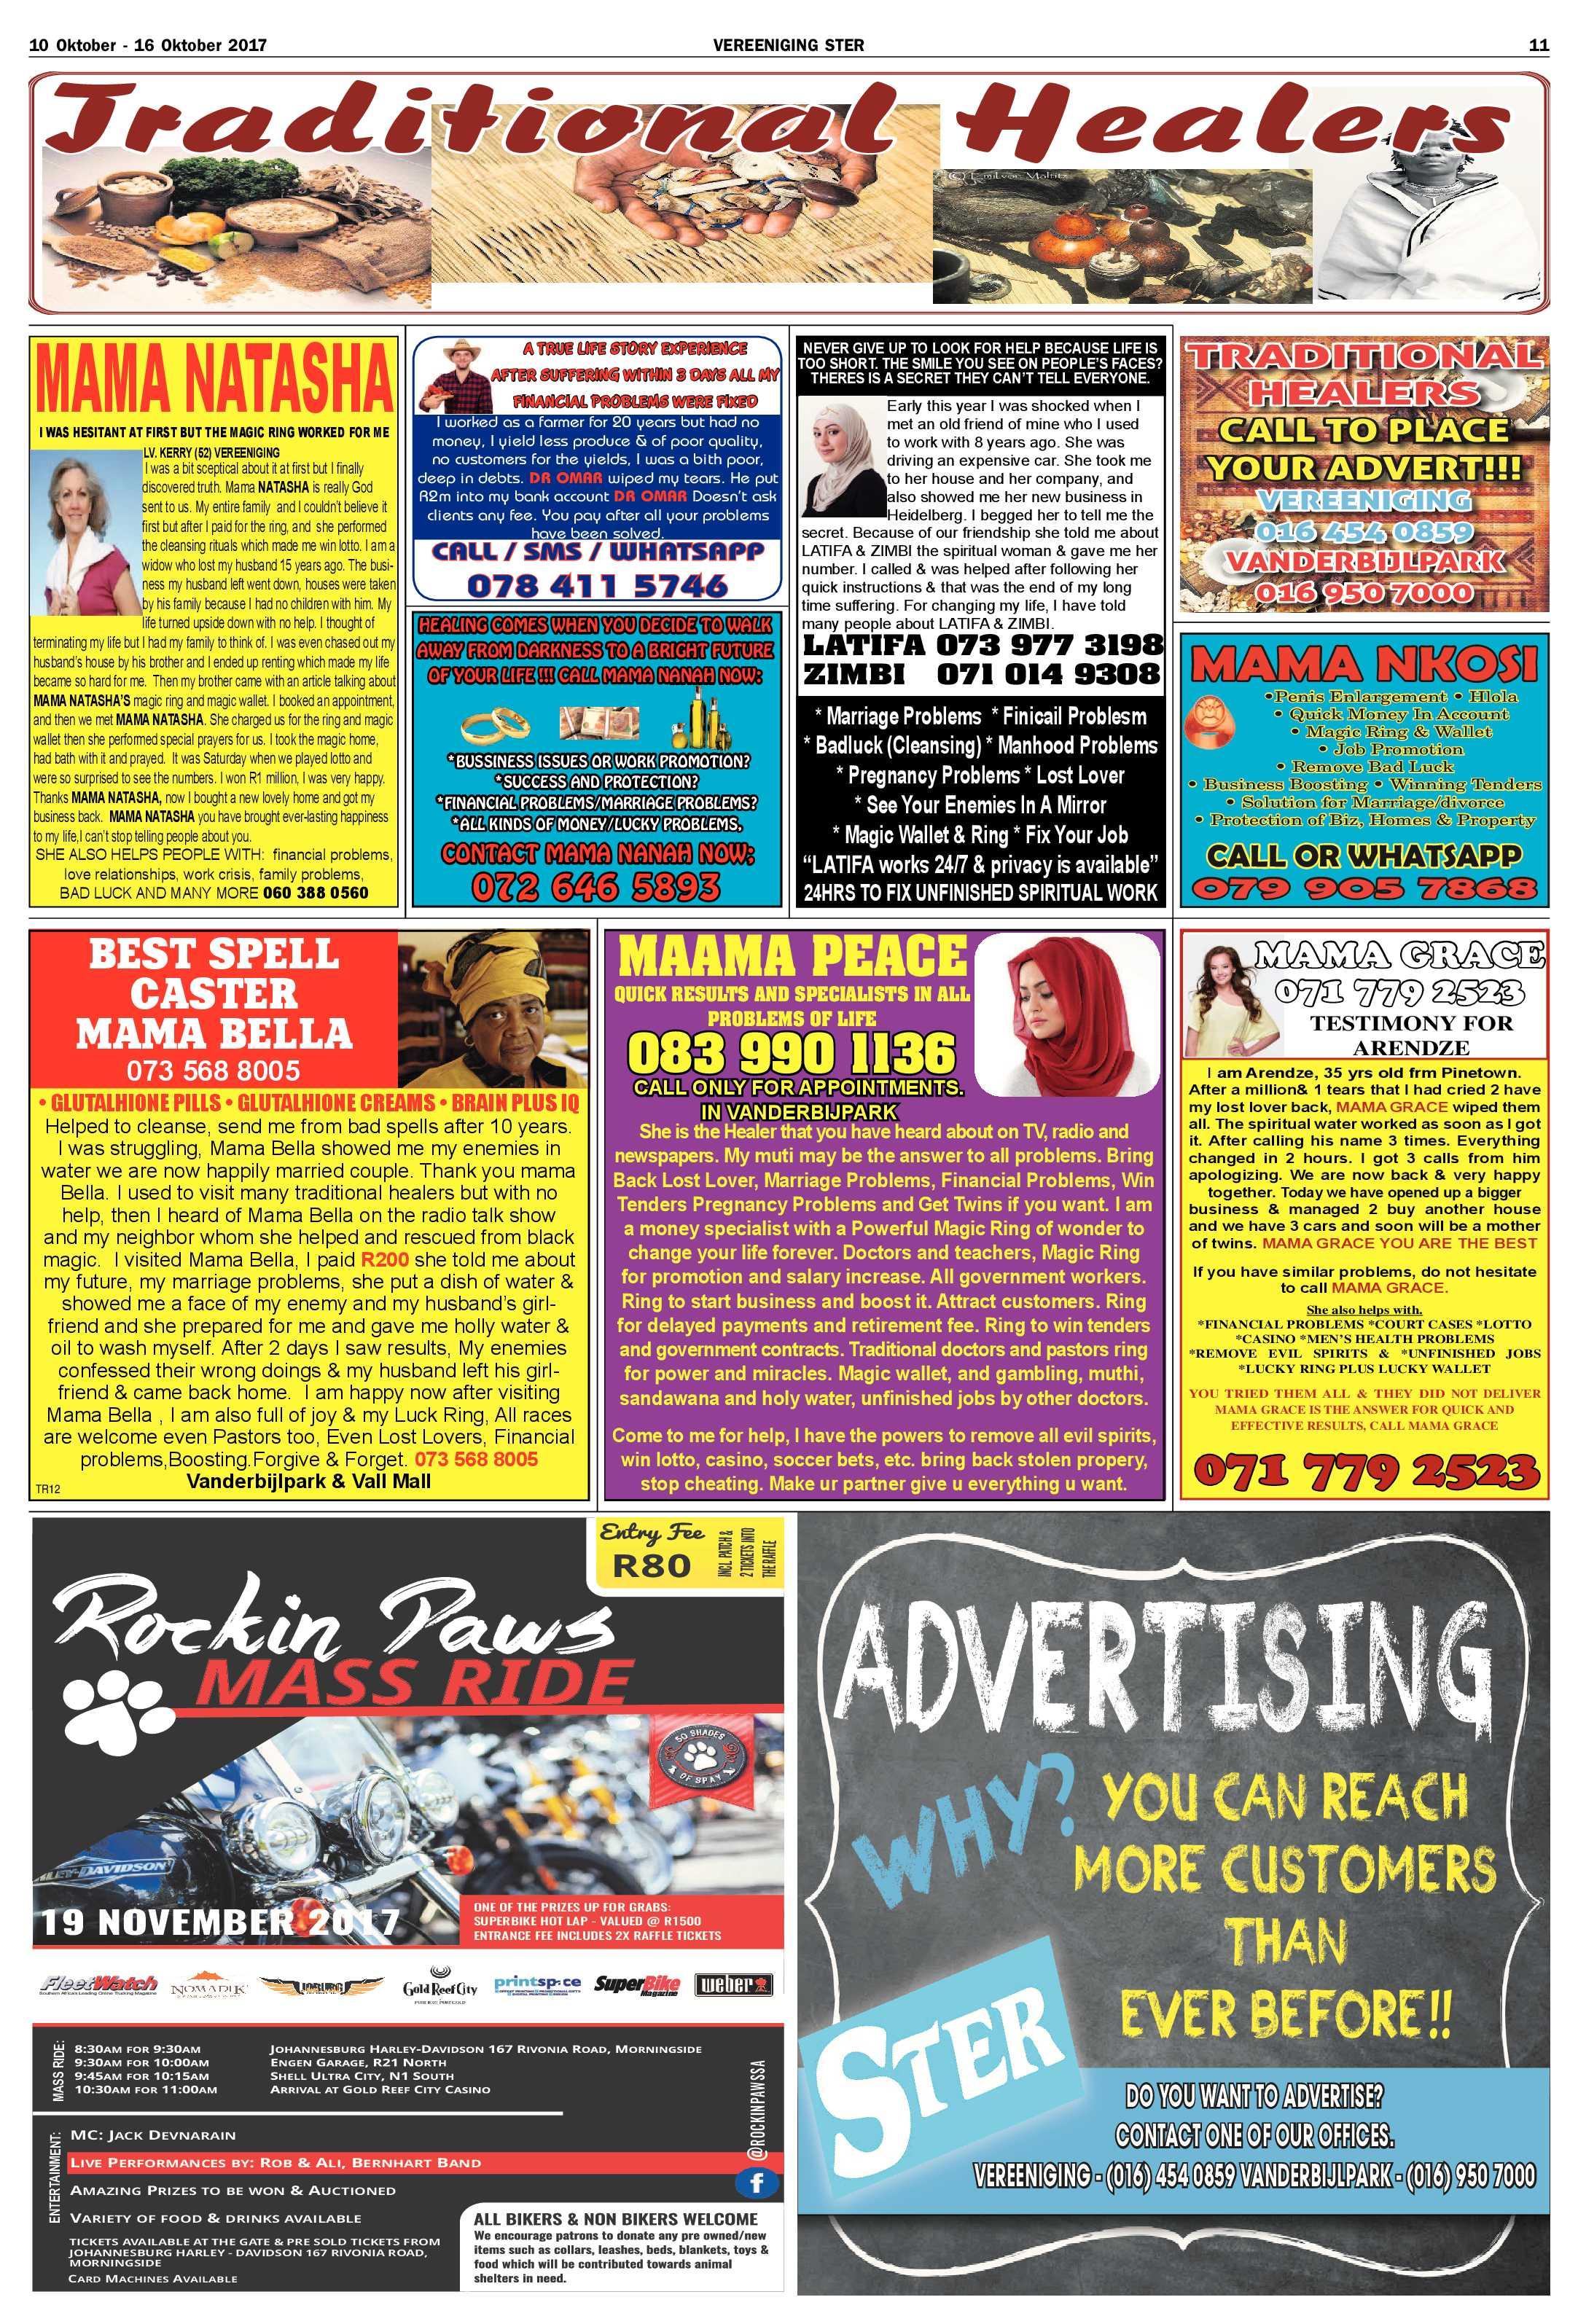 vereeniging-ster-10-16-oktober-2017-epapers-page-11